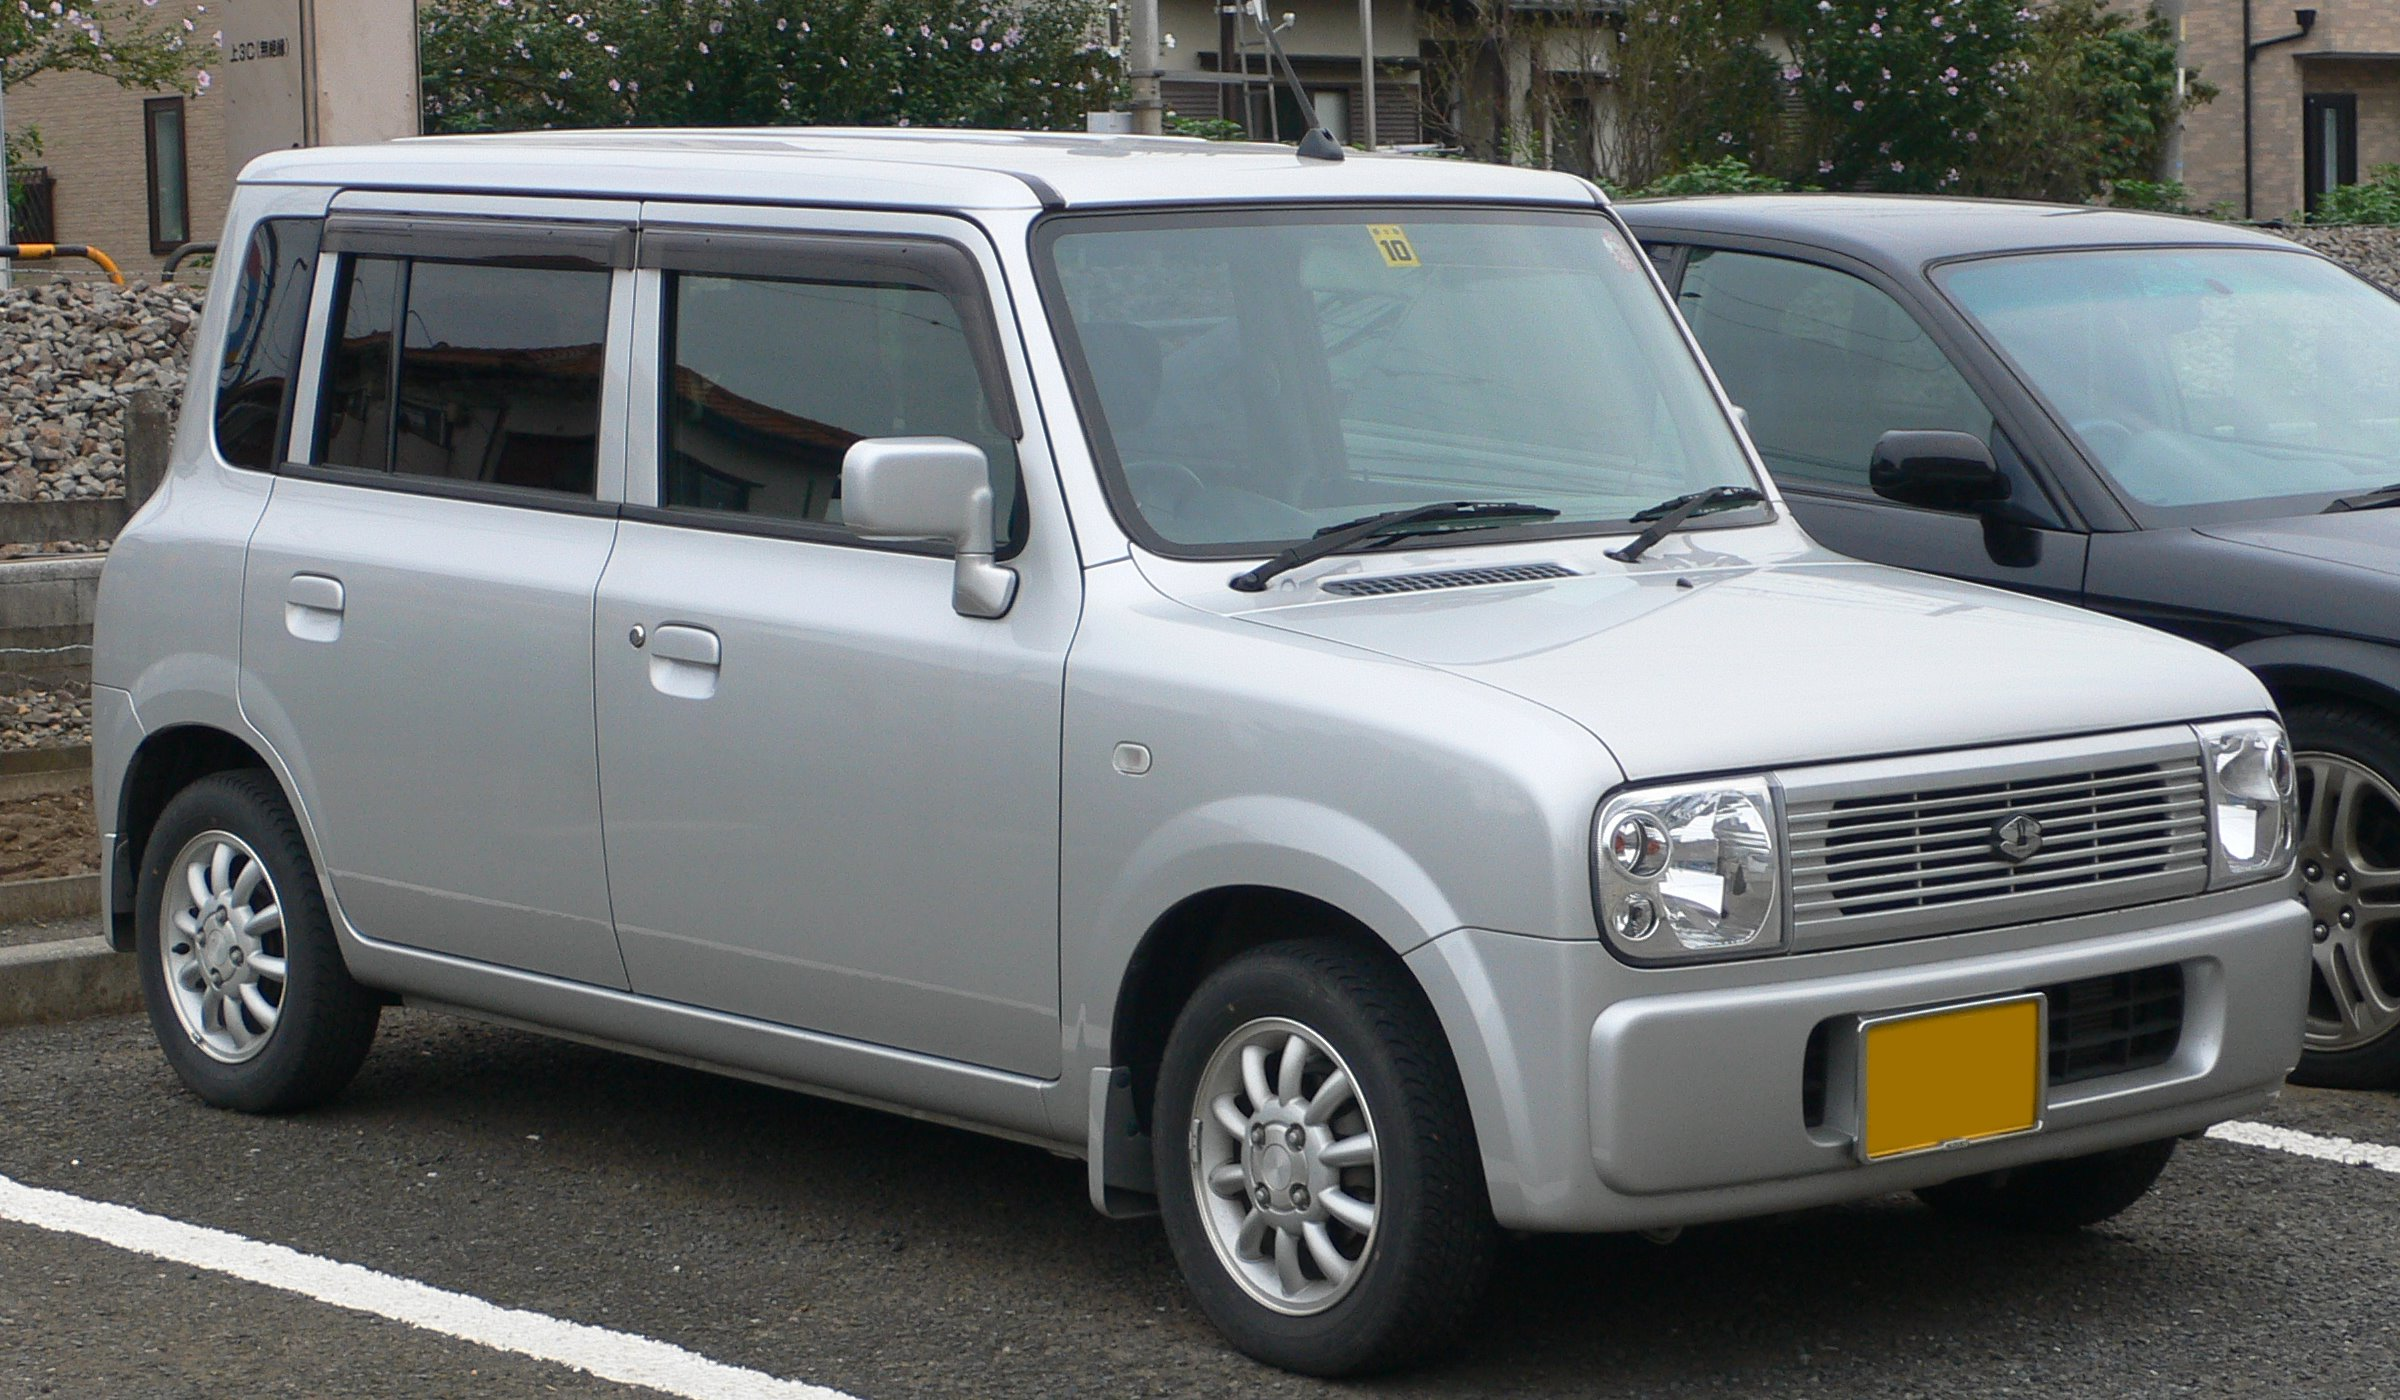 http://upload.wikimedia.org/wikipedia/commons/b/b5/2002_Suzuki_Alto-Lapin_01.jpg